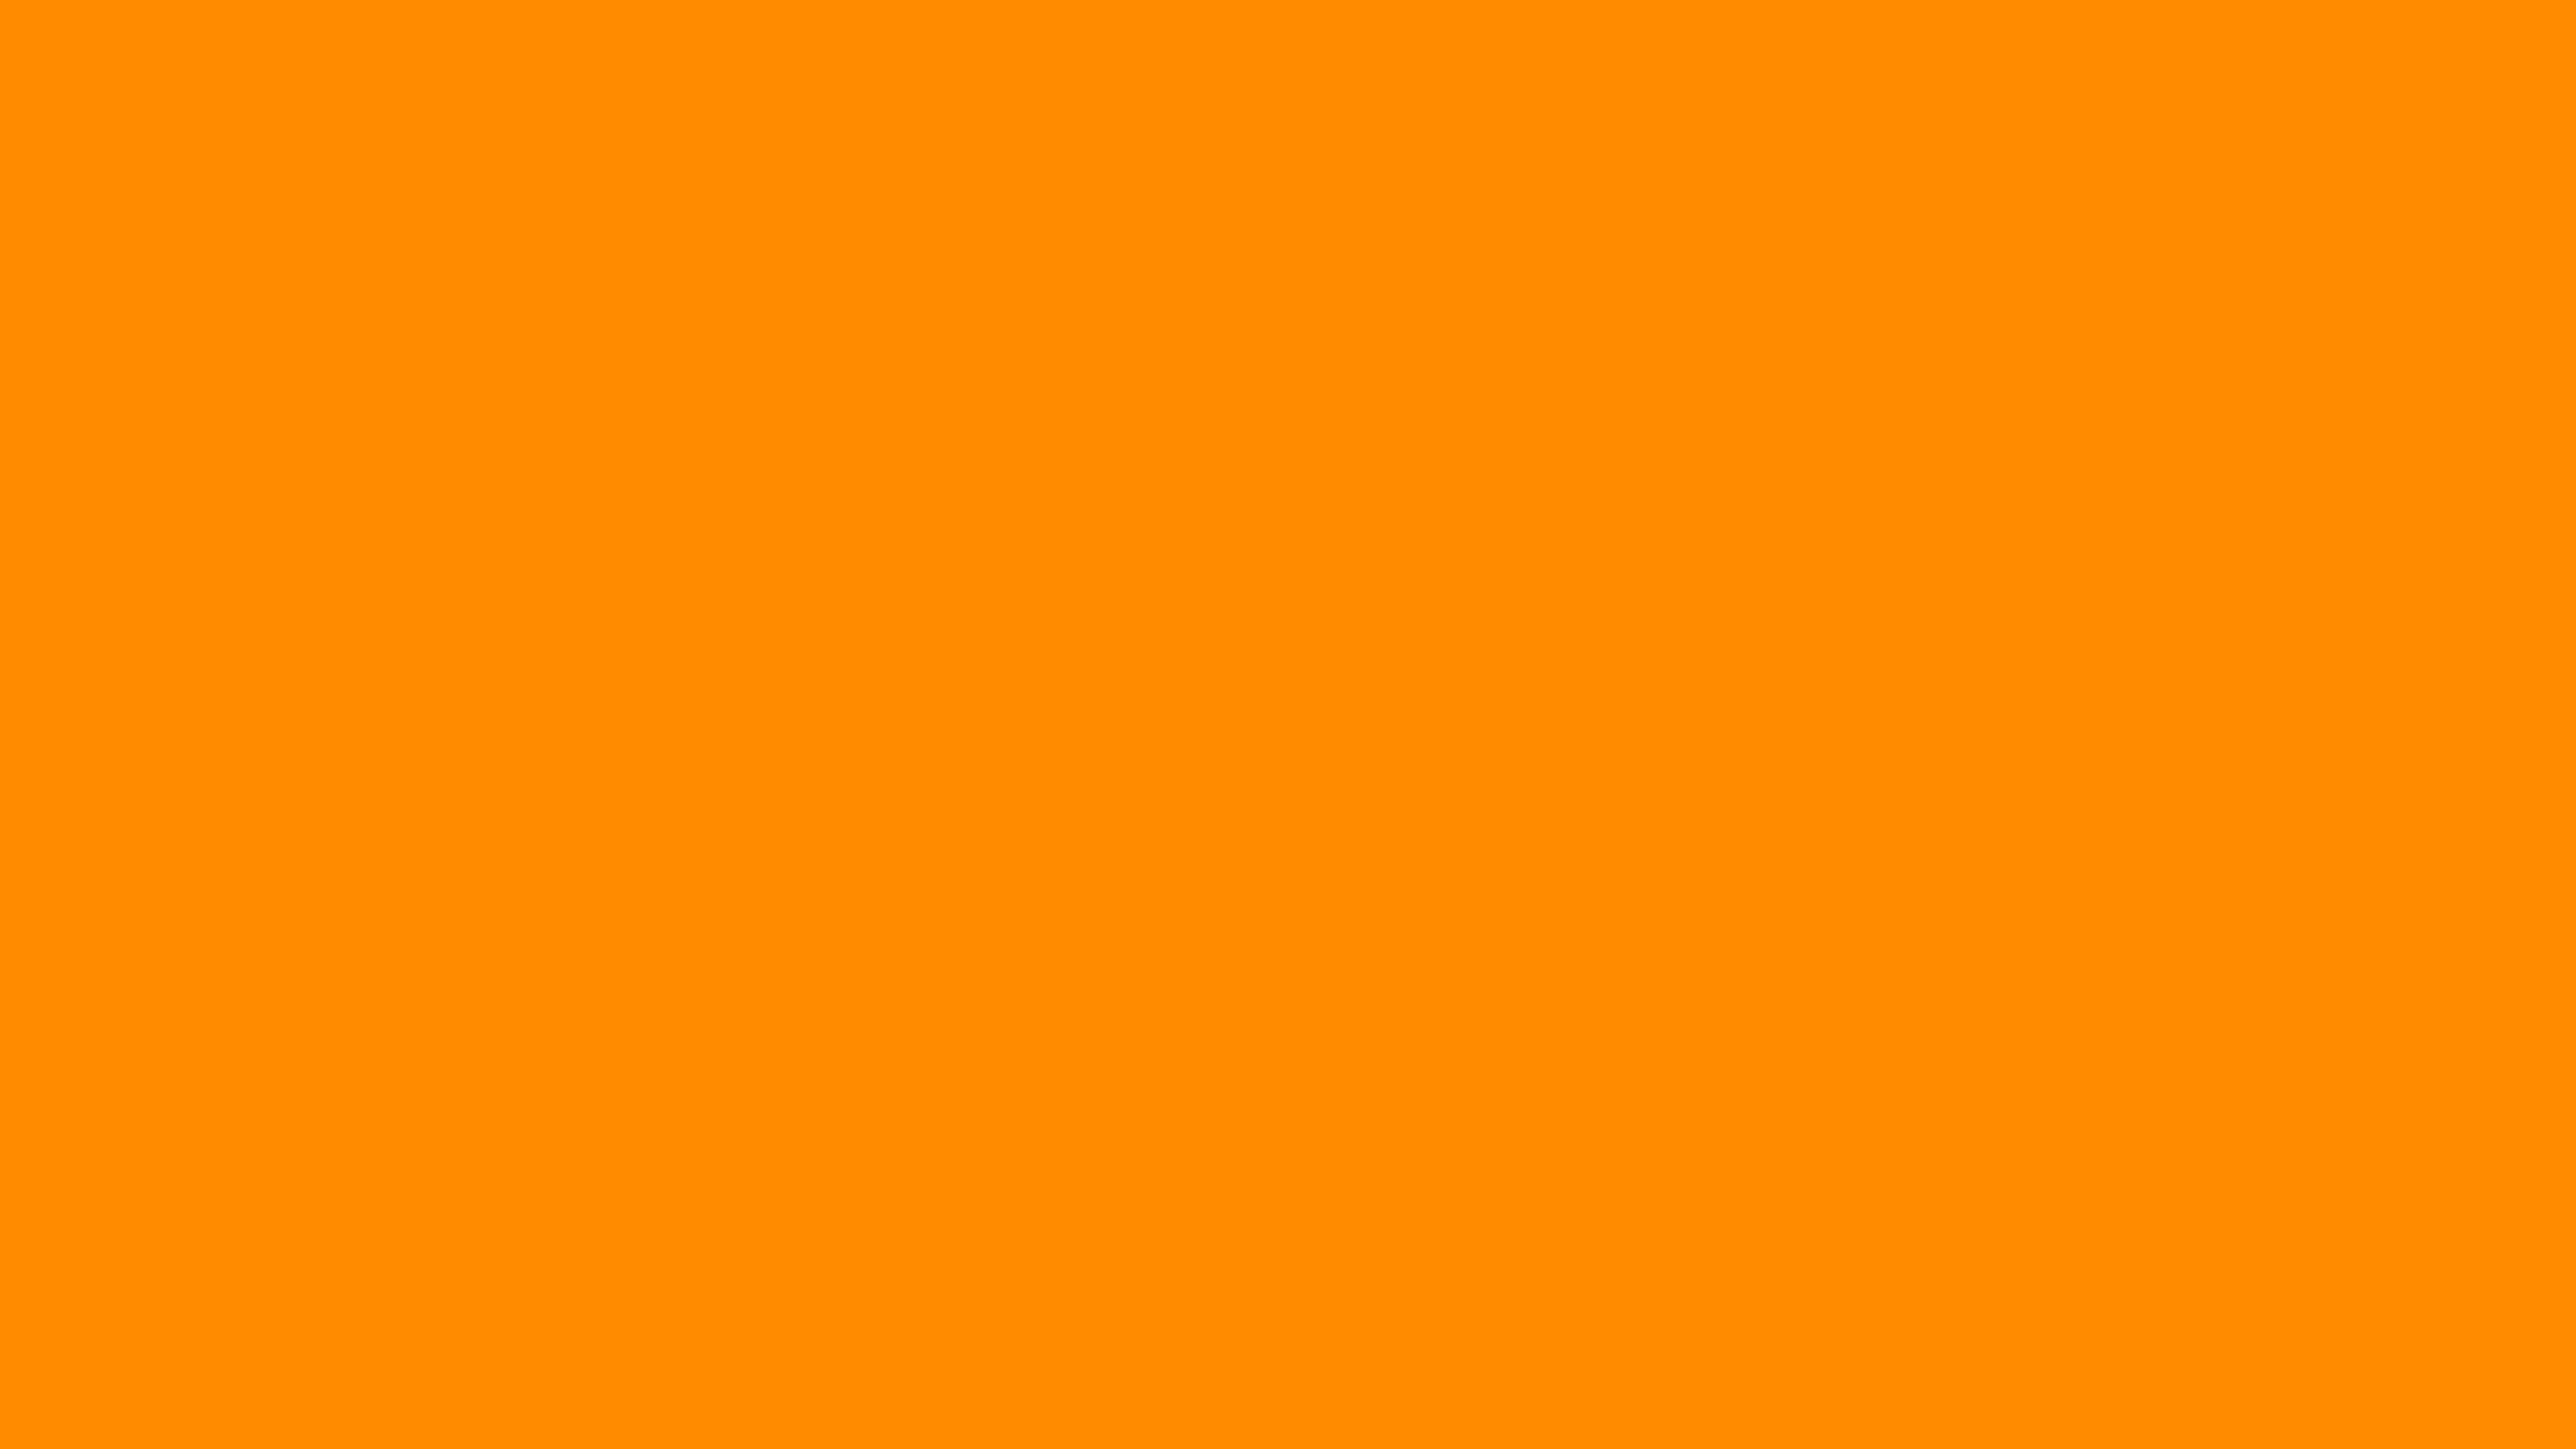 4096x2304 Dark Orange Solid Color Background